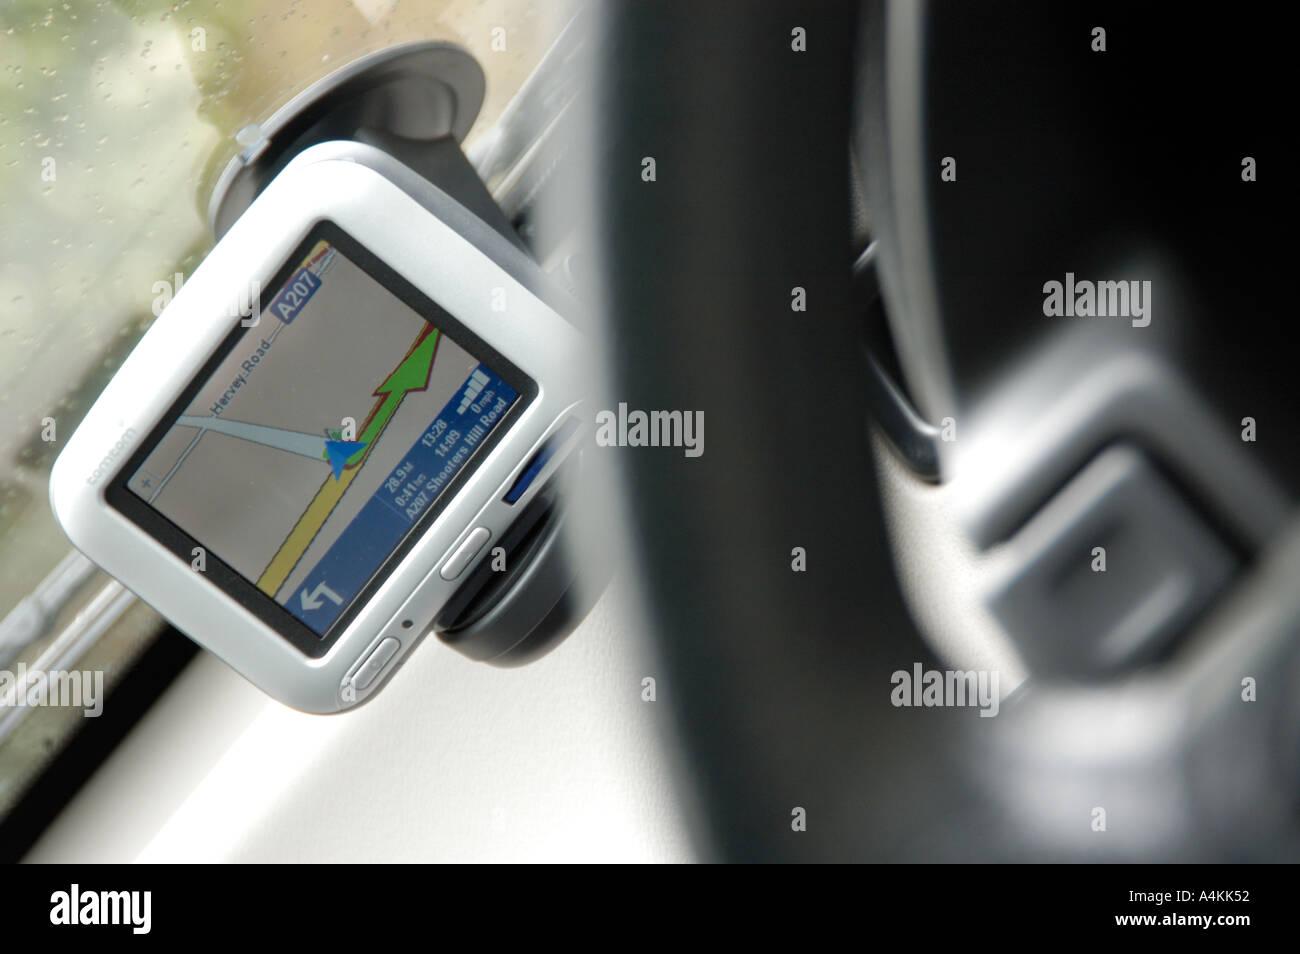 Satellite navigation on a car dashboard - Stock Image